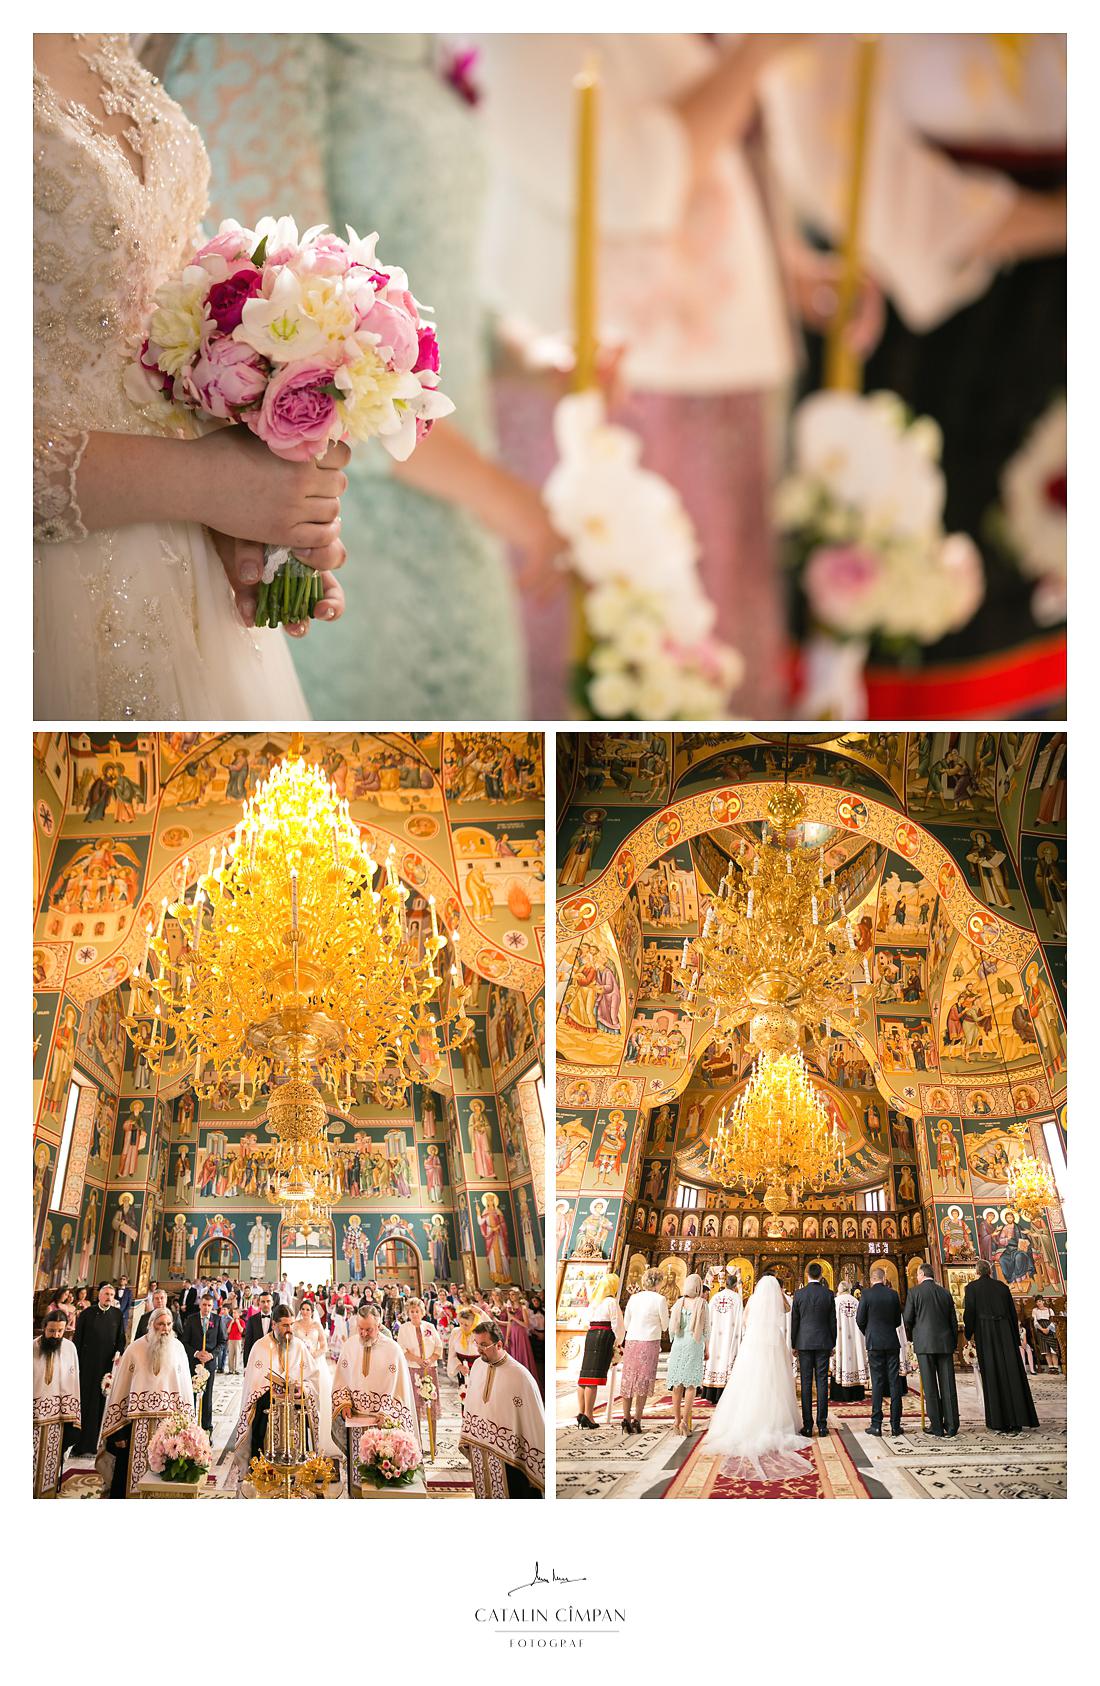 Florentina-Ionut-fotografii-nunta-08